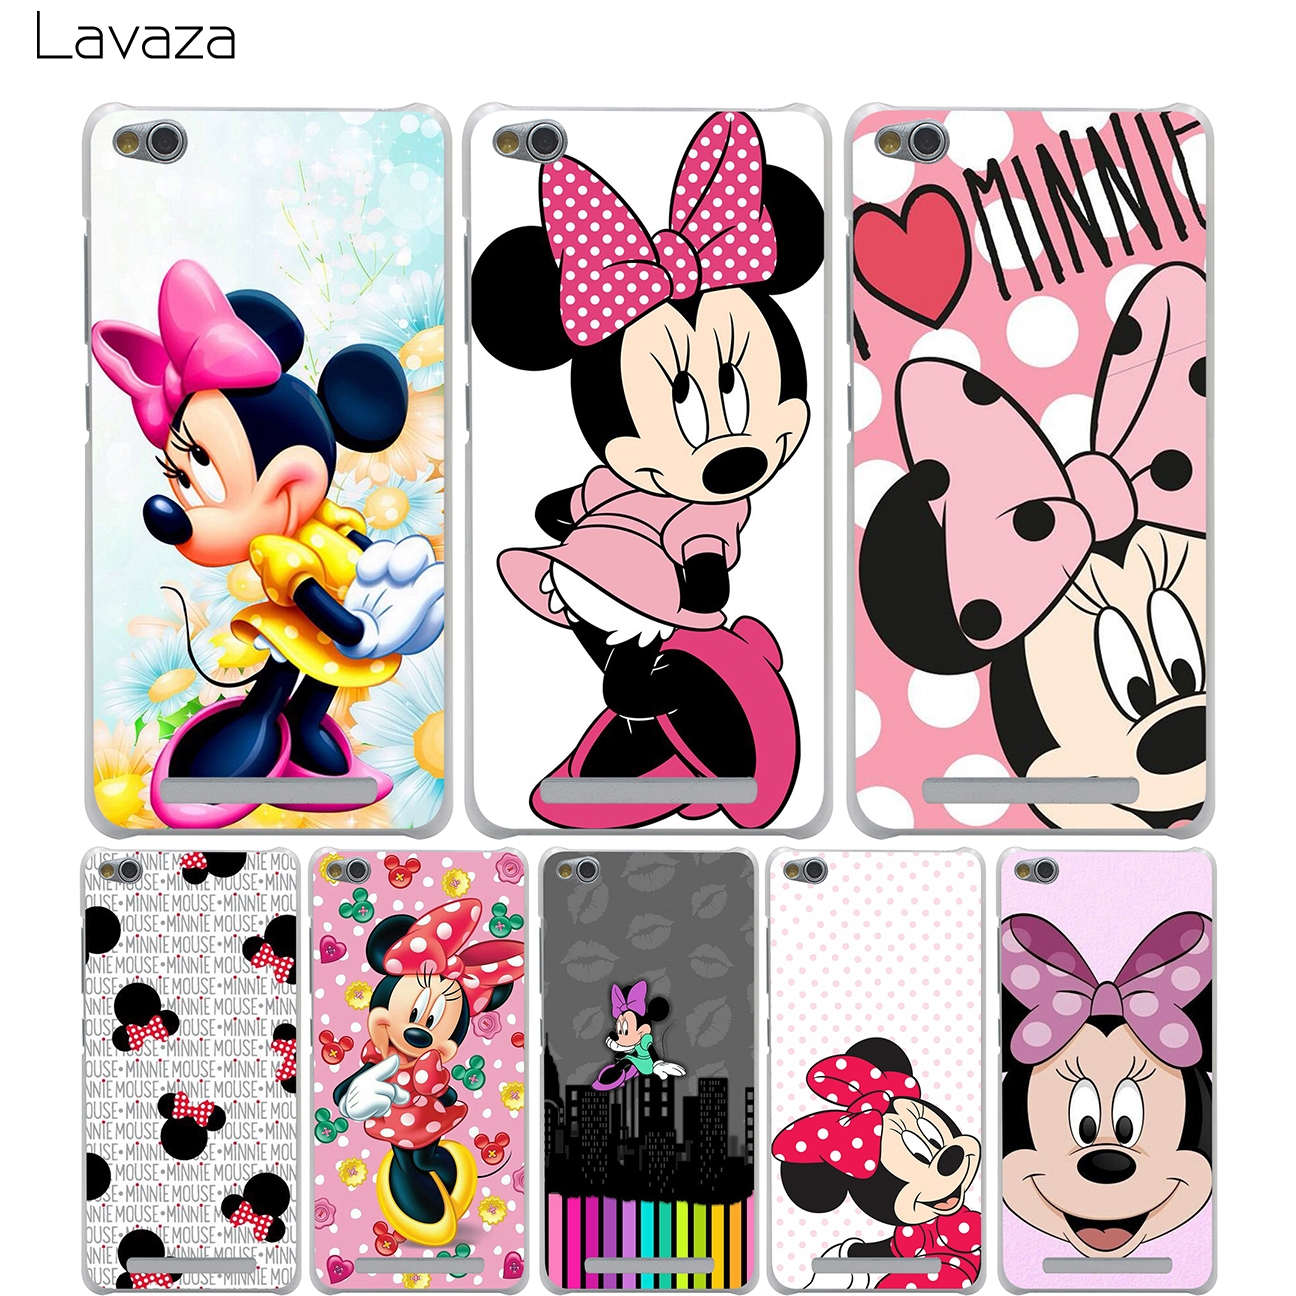 Lavaza Minnie Mouse Cover Case For Xiaomi Redmi Note Mi 3 3s 4x 4 4a Headseat Putih Mix Pro Por Atacado Em Lotes De Iboann Dos Desenhos Animados 3d Mickey Silicone Suave Capa Gel